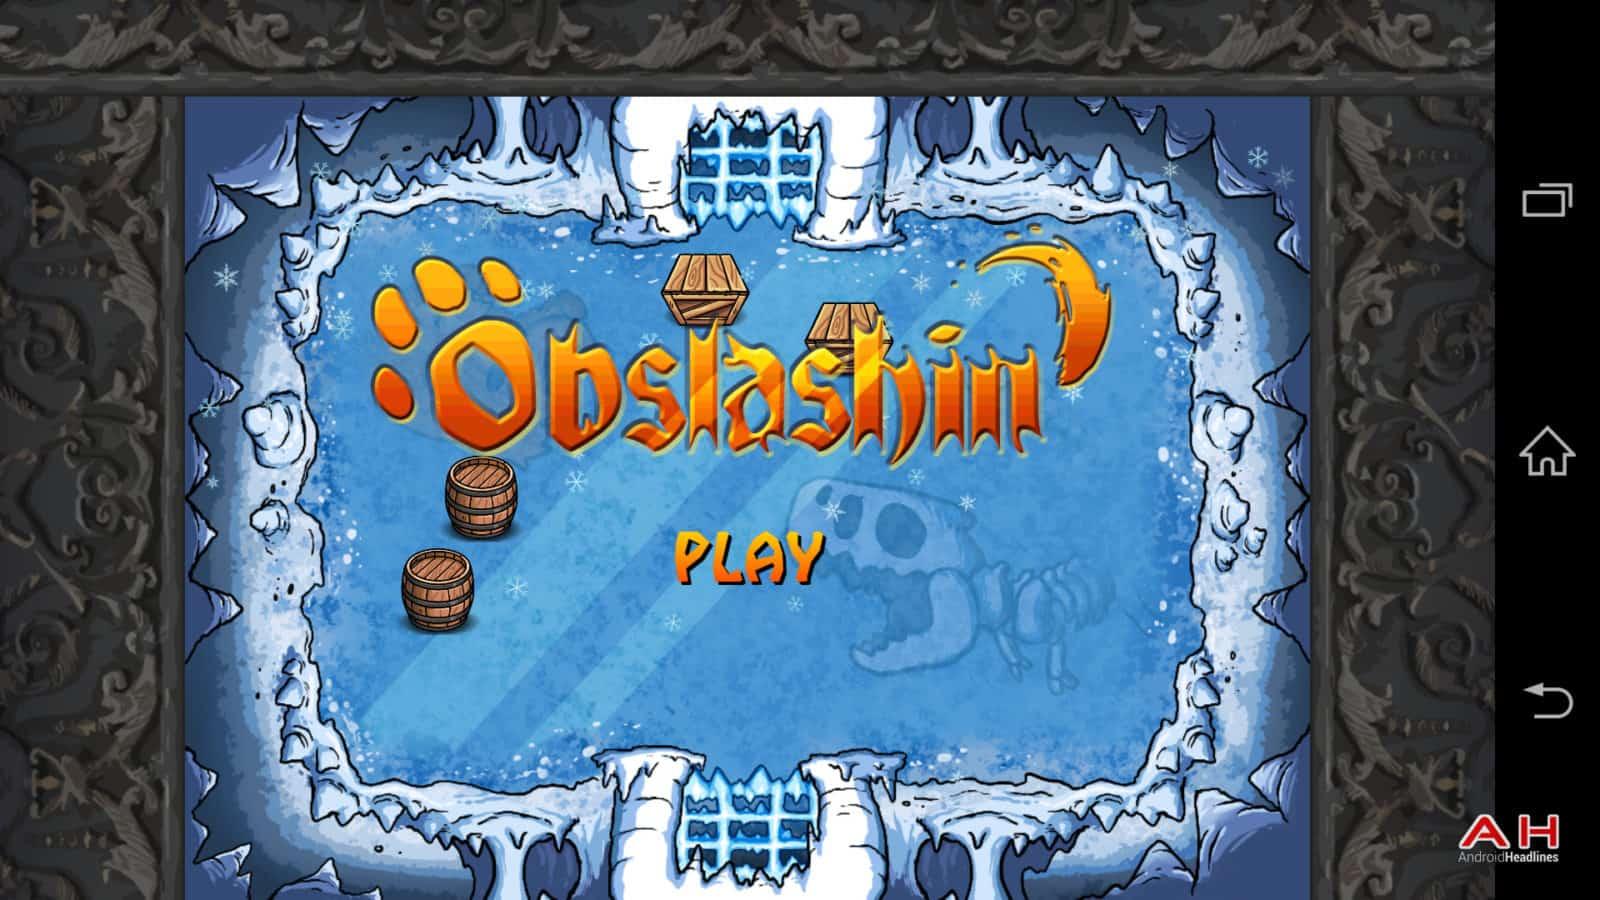 AH Obslashin'-7